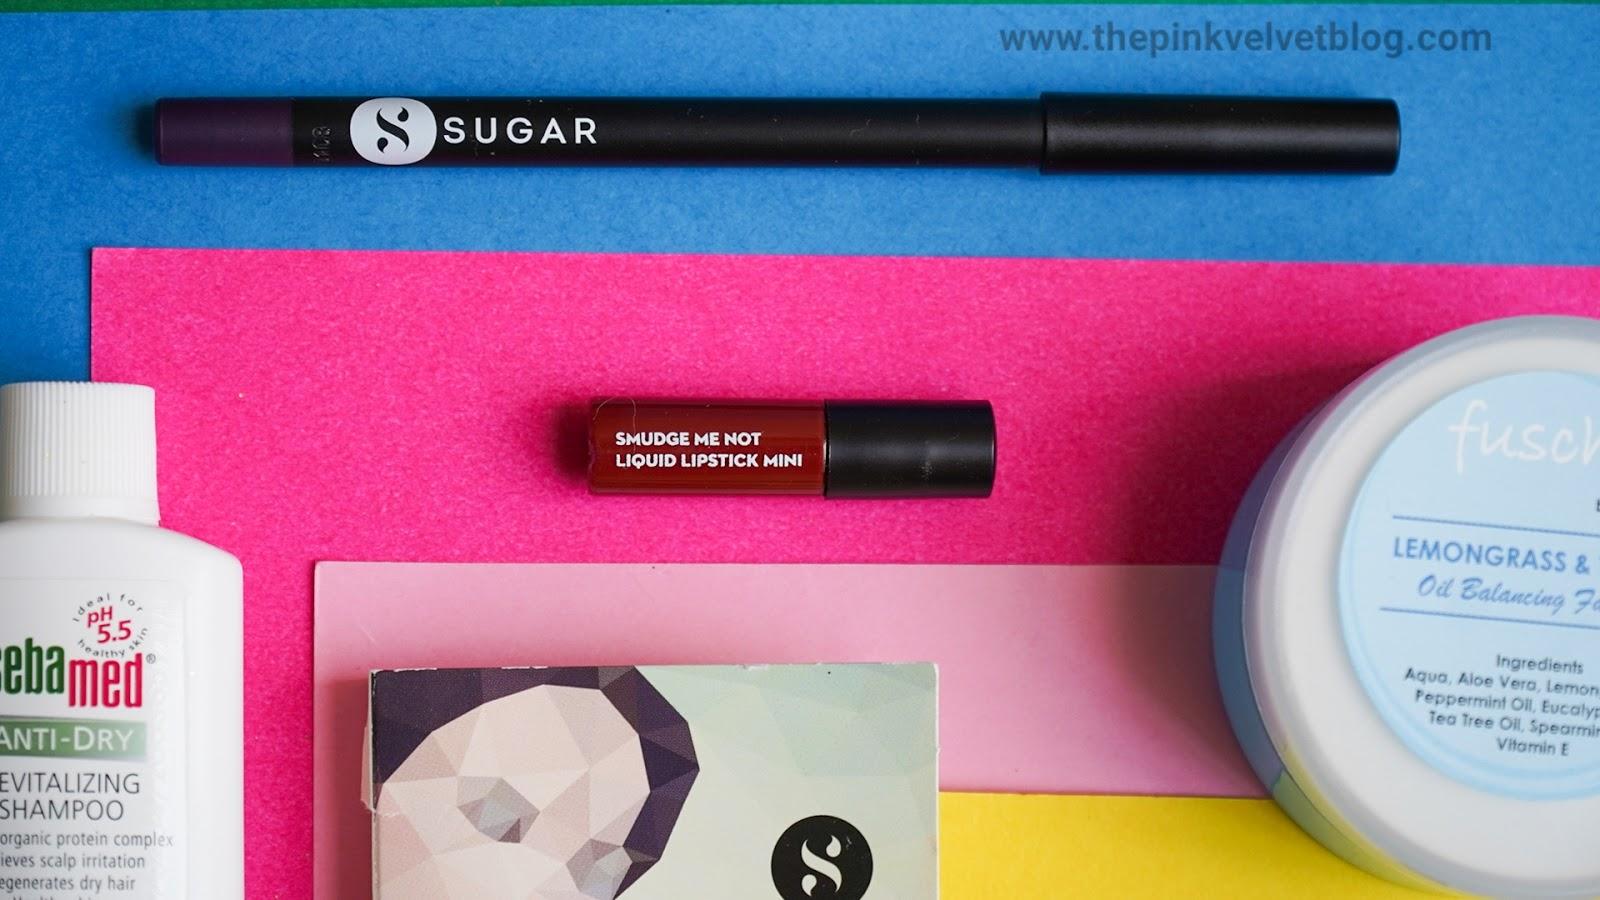 SUGAR Smudge Me Not Liquid Lipstick Sample - 01 Brazen Raisin - November Fab Bag